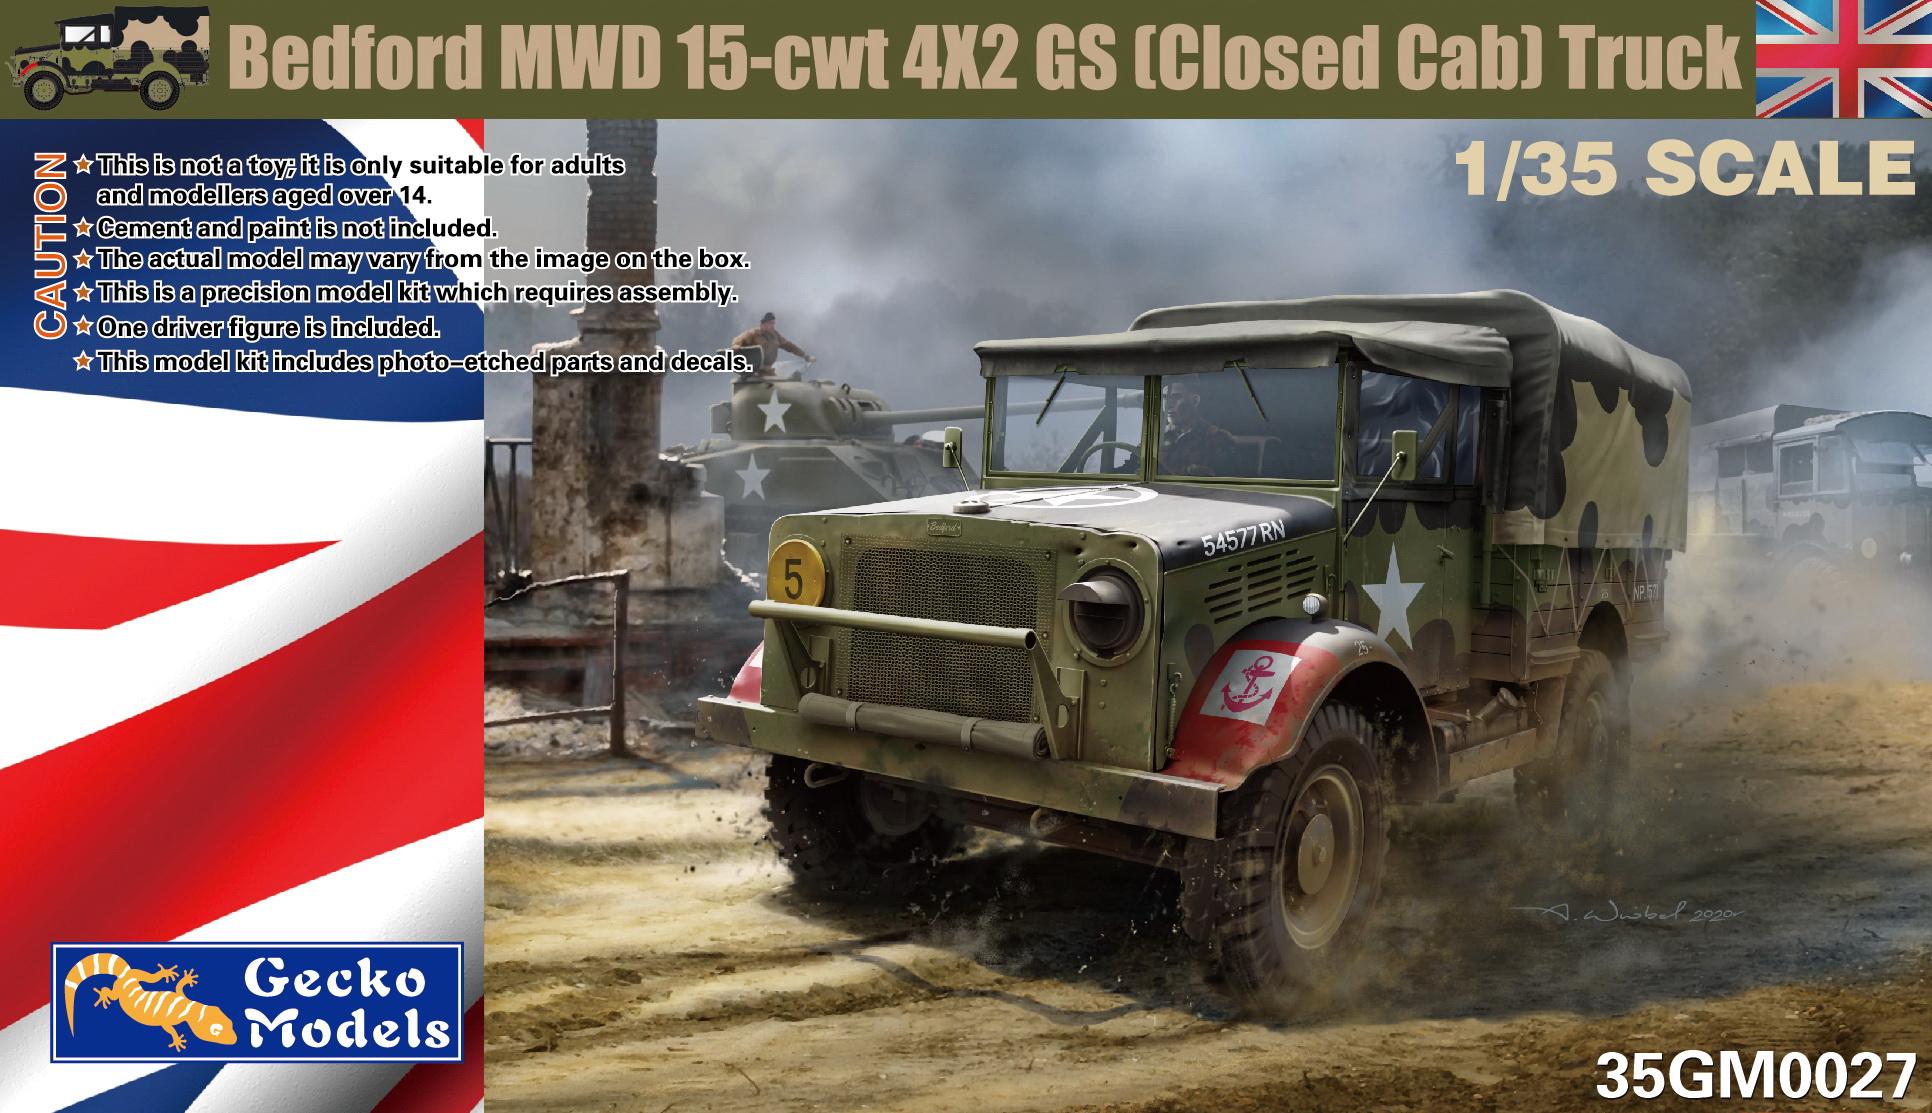 001 - Bedford MWD Late.jpg